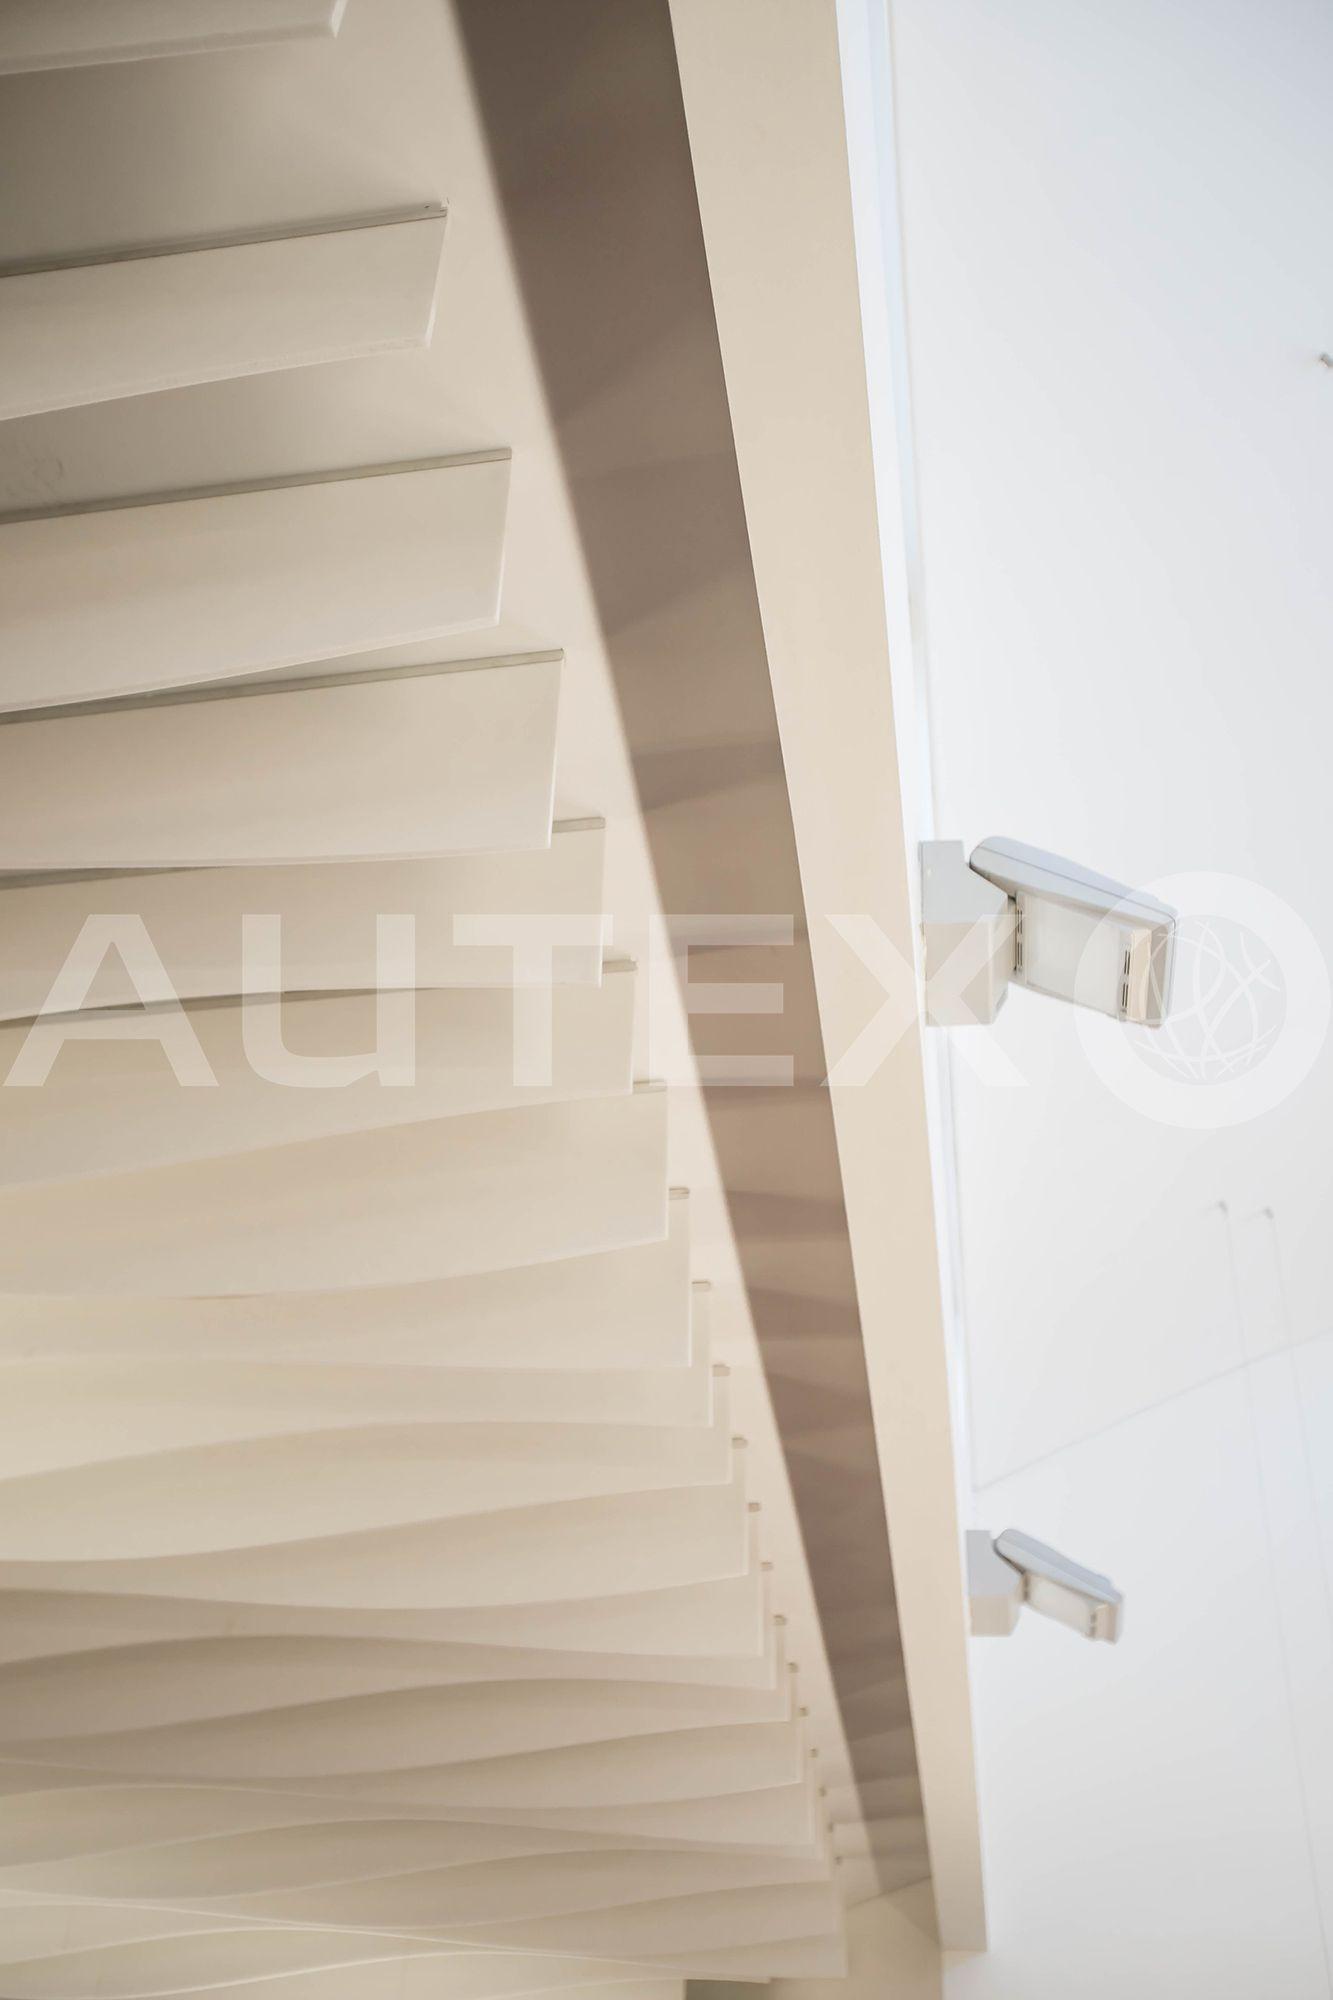 Autex Interior Acoustics Frontier Talus Trinity College Nsw Australia Direct Fix To Ceiling Colour Pavilion Acousti Home Interior Ceiling System